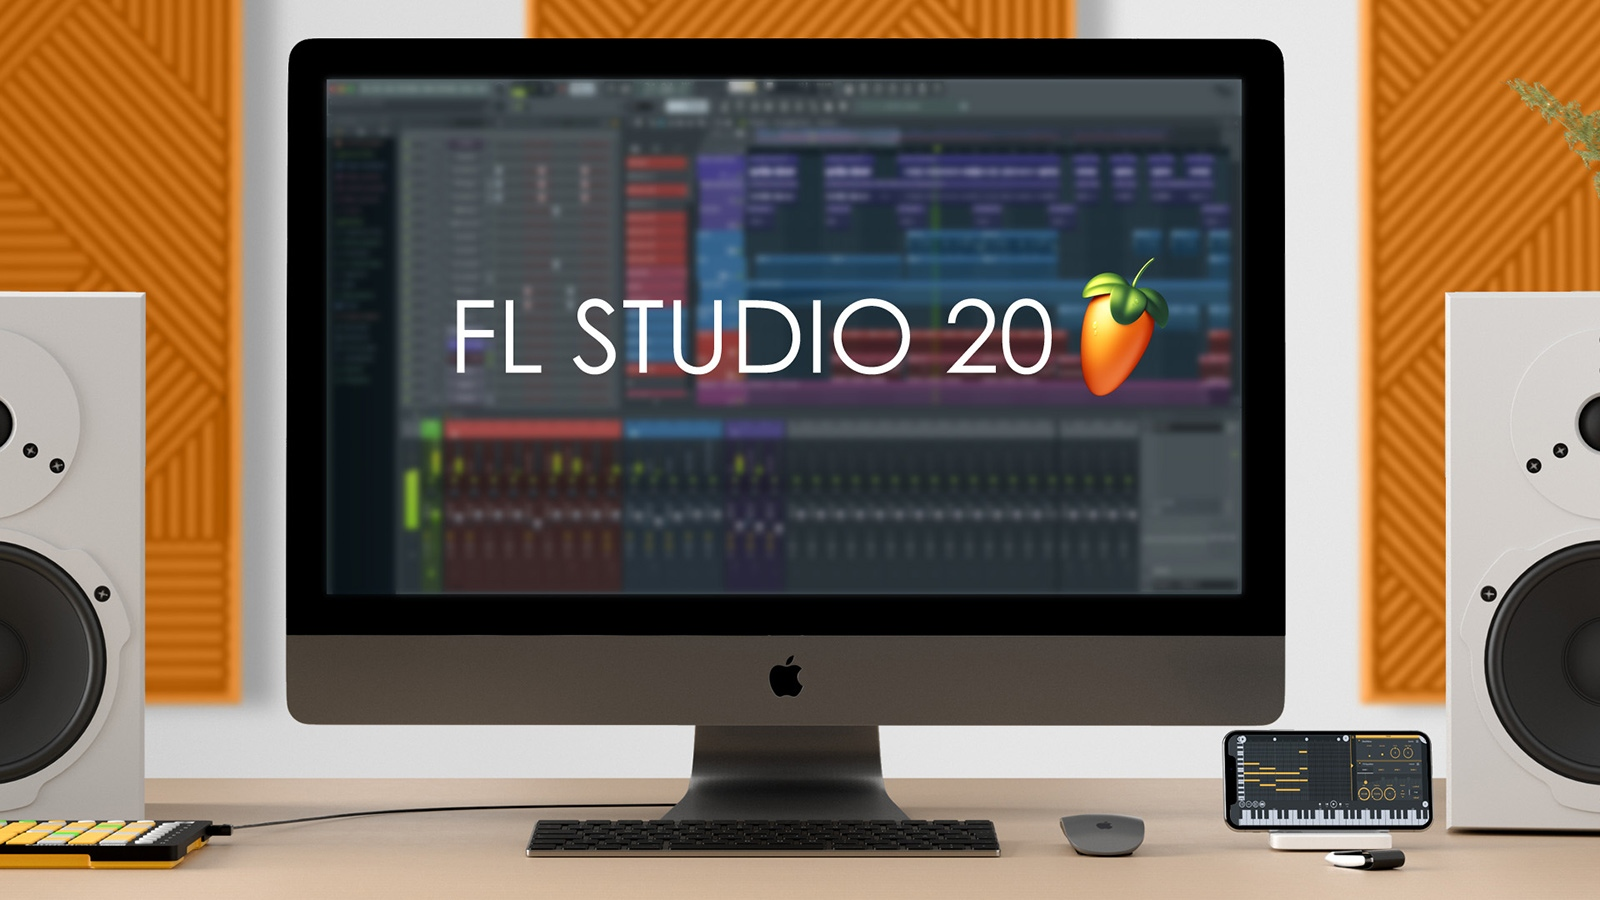 "<h2 class=""title"">『FL STUDIO 20』待望の新バージョン、Mac環境へ対応!</h2>"